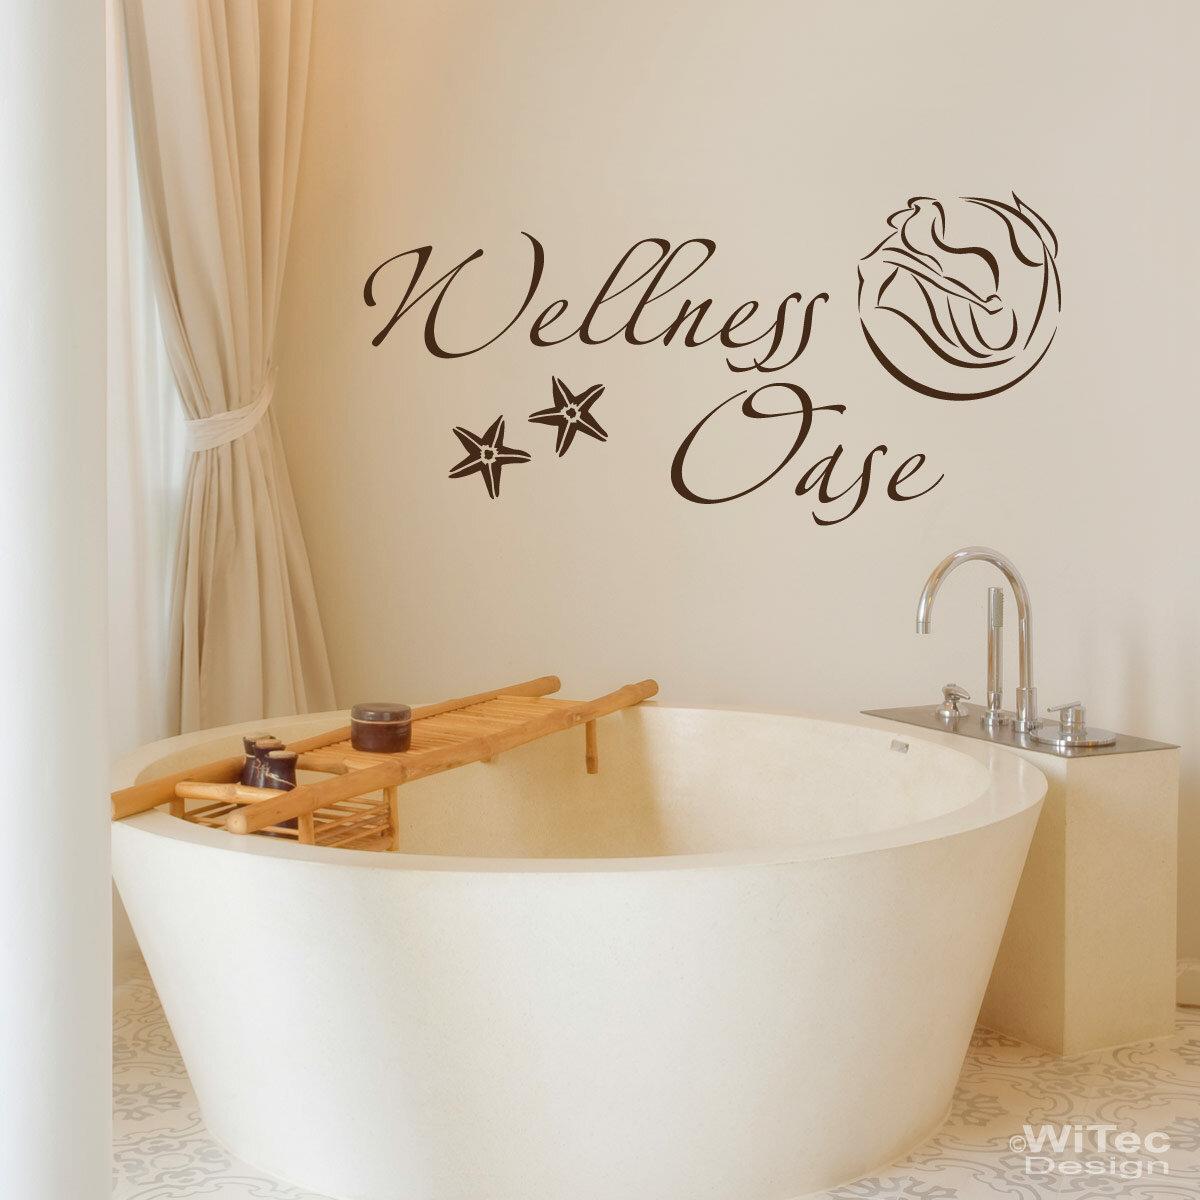 Badezimmer Regeln